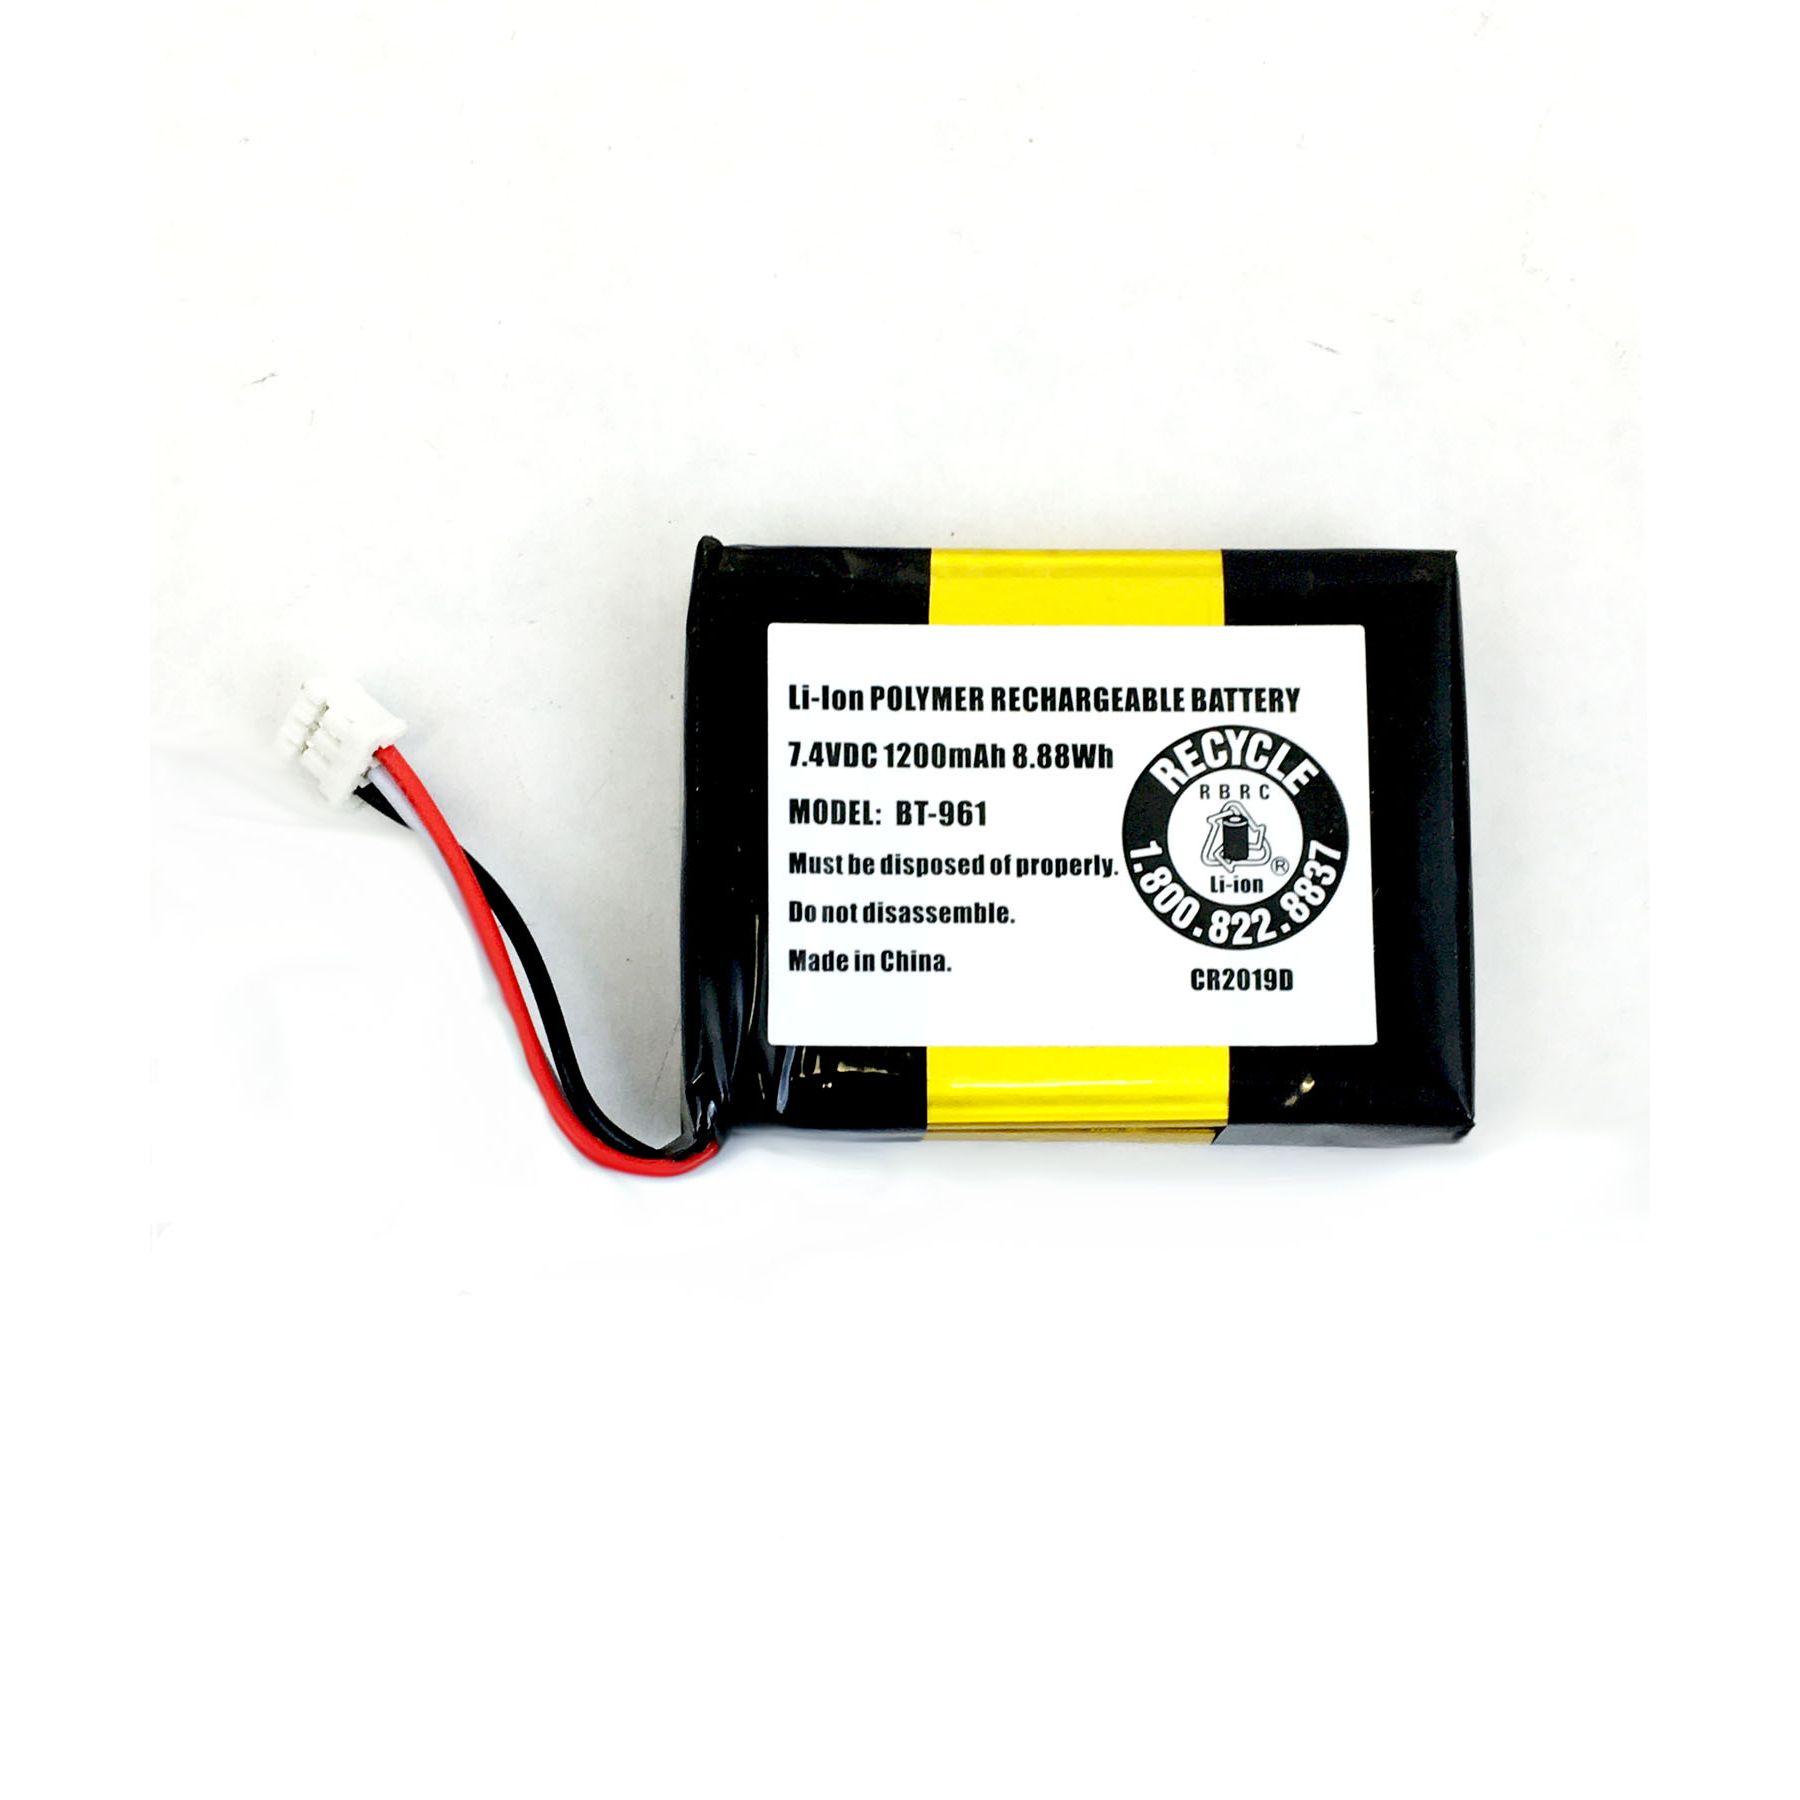 BBTG0961001 - Uniden Battery For Atlantis275 Radio